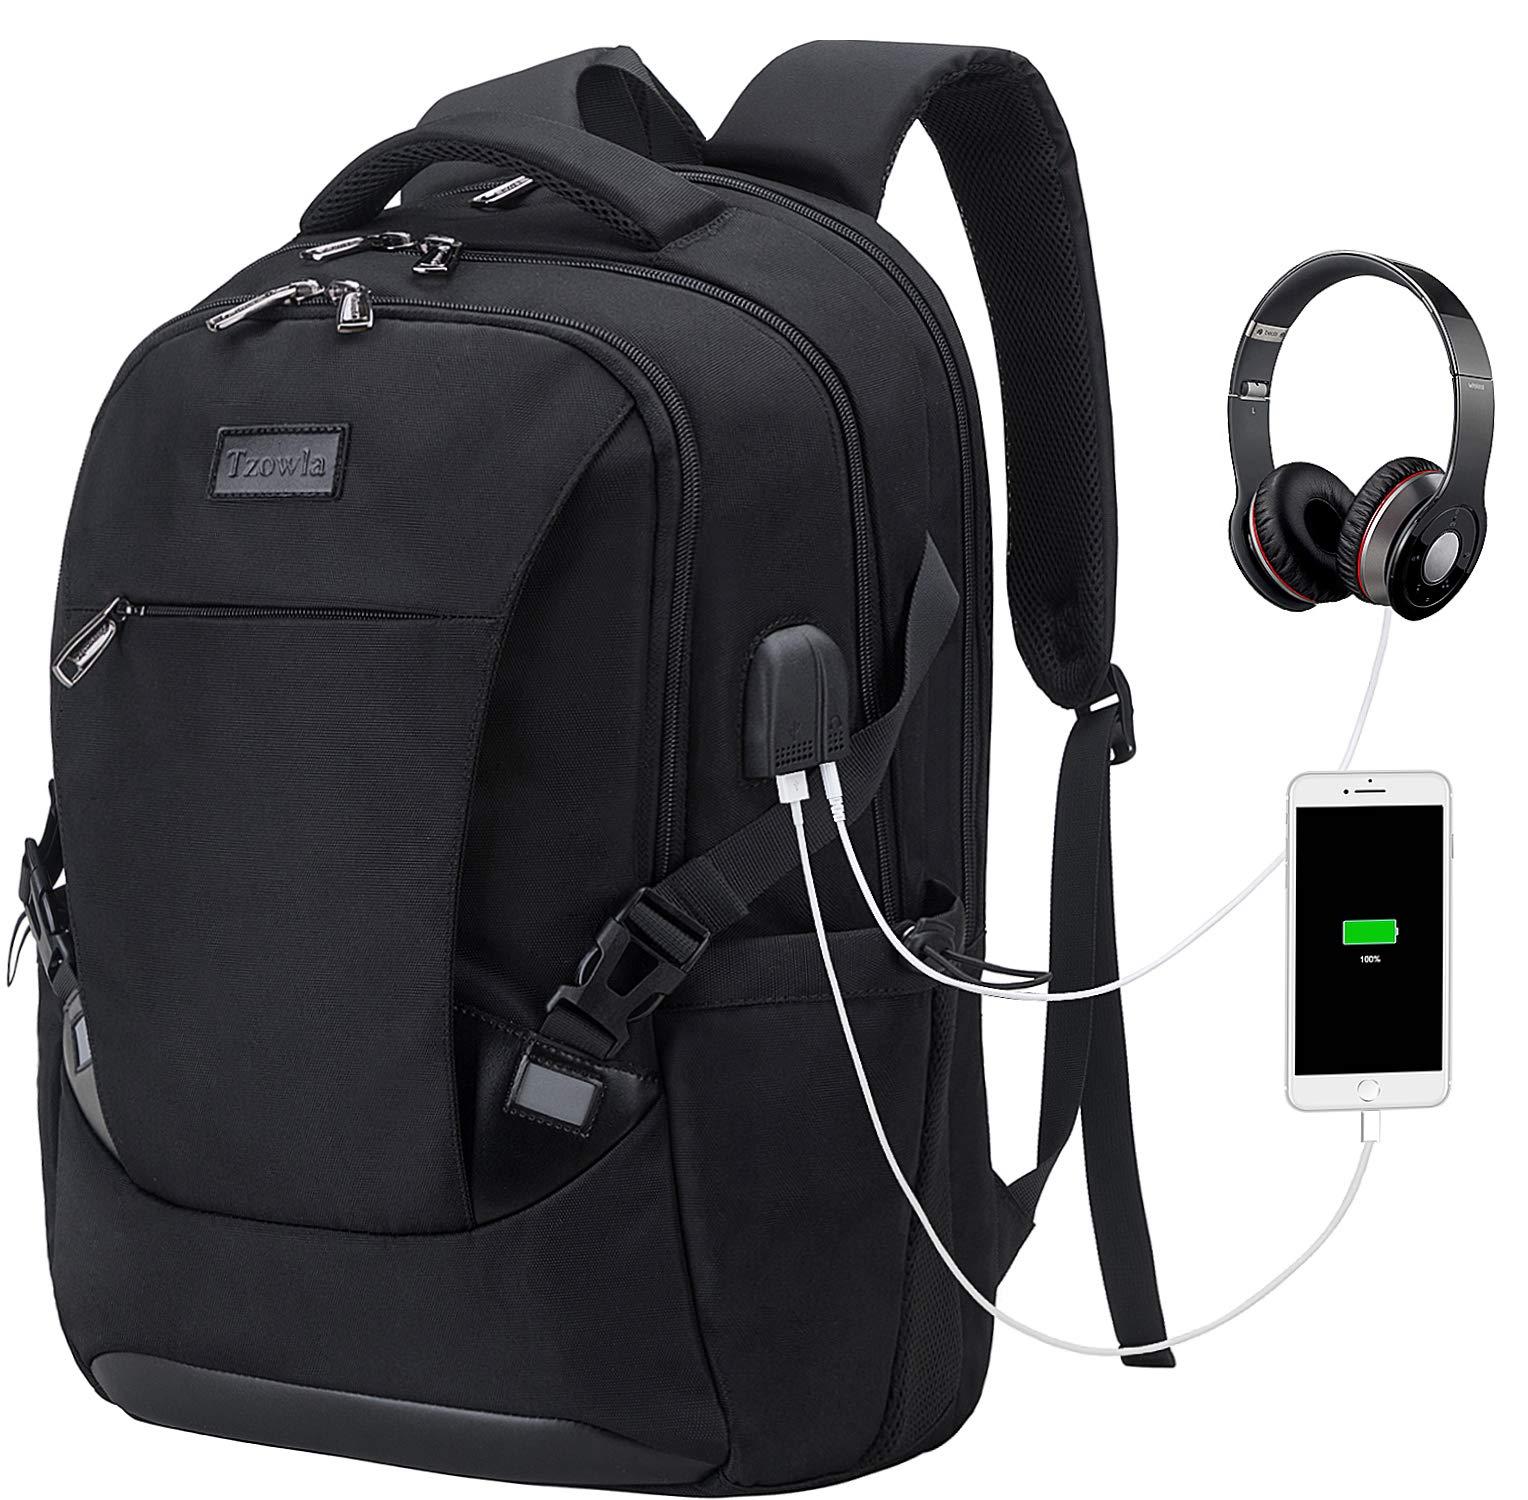 Tzowla Backpack Waterproof Business Headphone